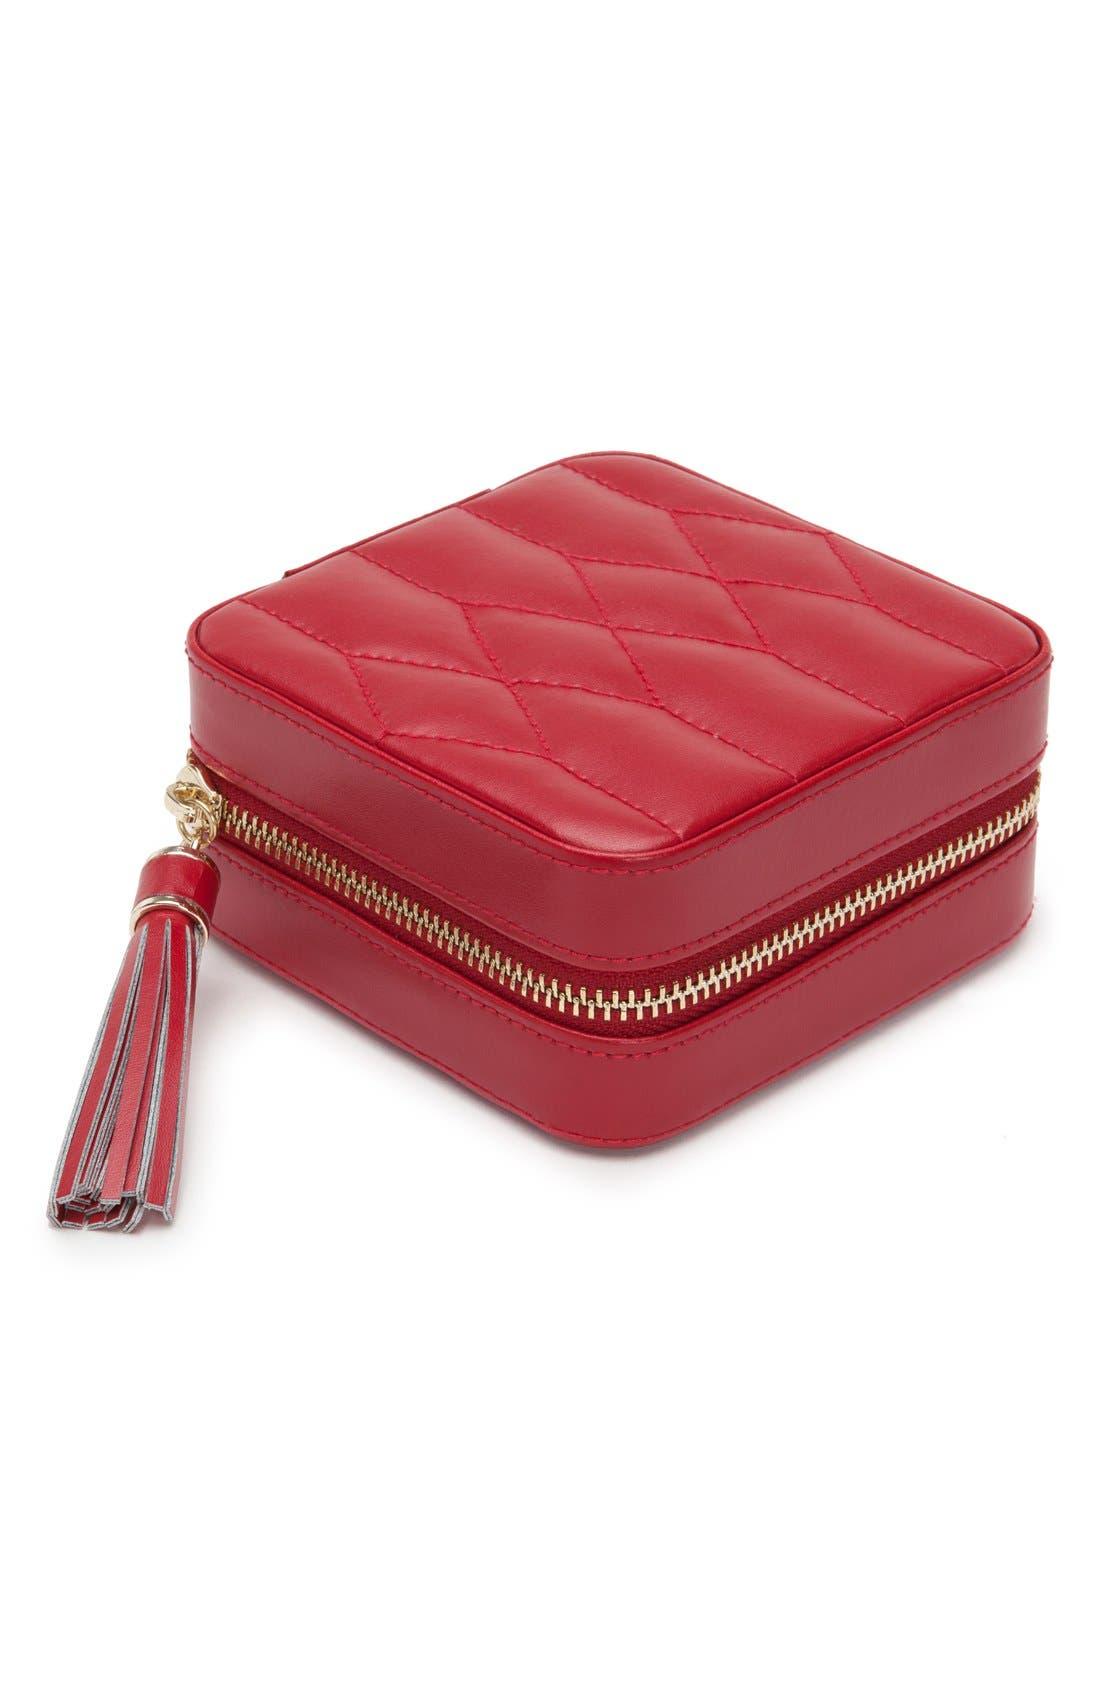 WOLF 'Caroline' Travel Jewelry Case - Red